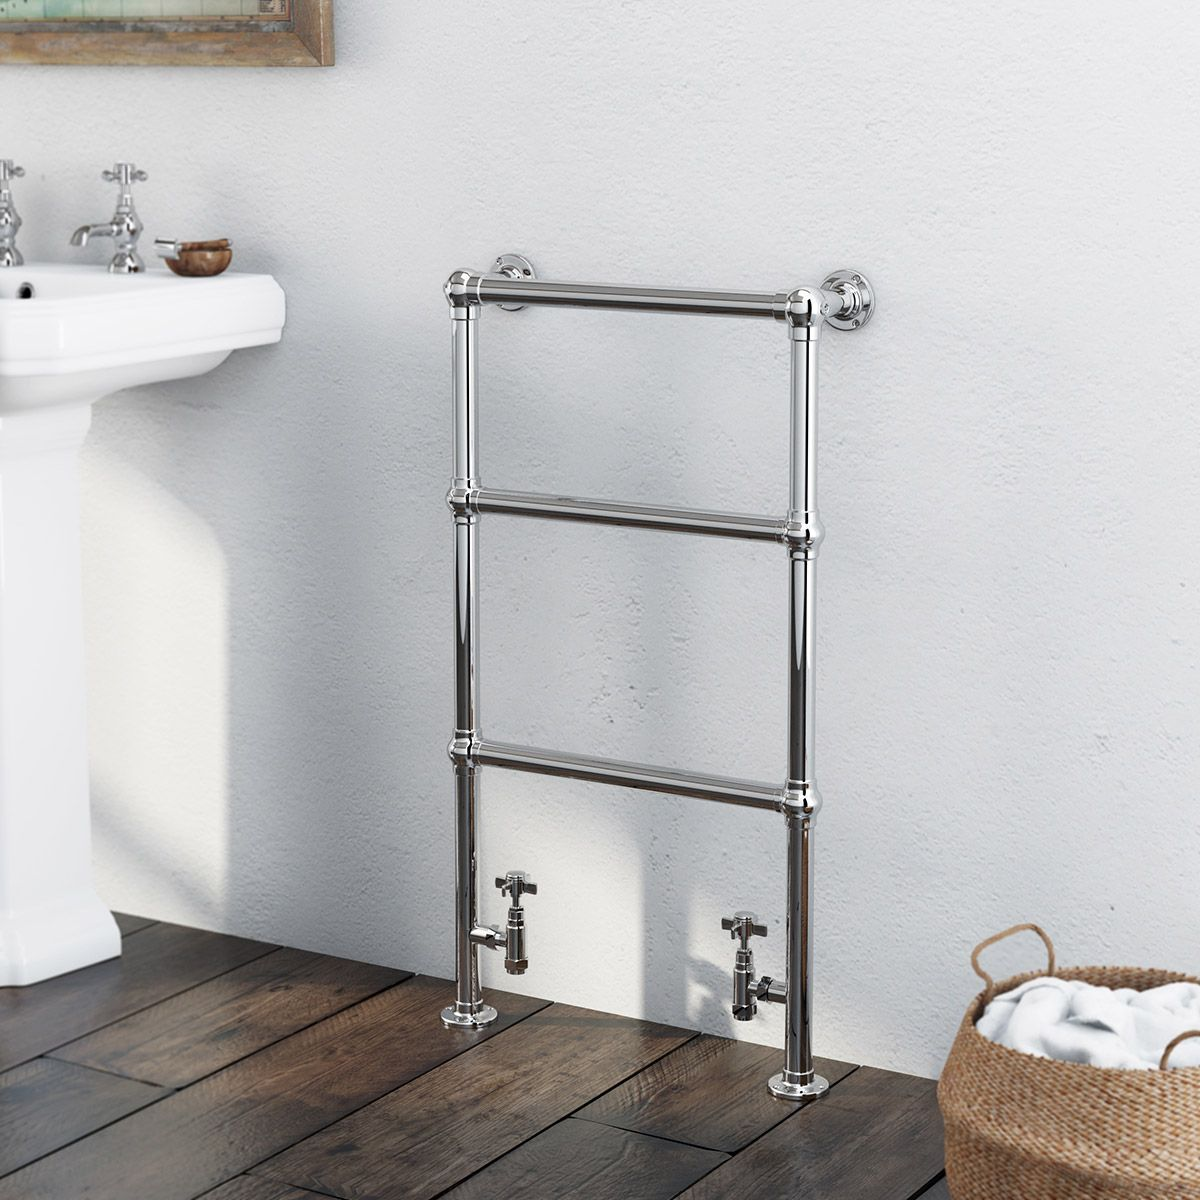 Kensington Heated Towel Rail 914 x 535